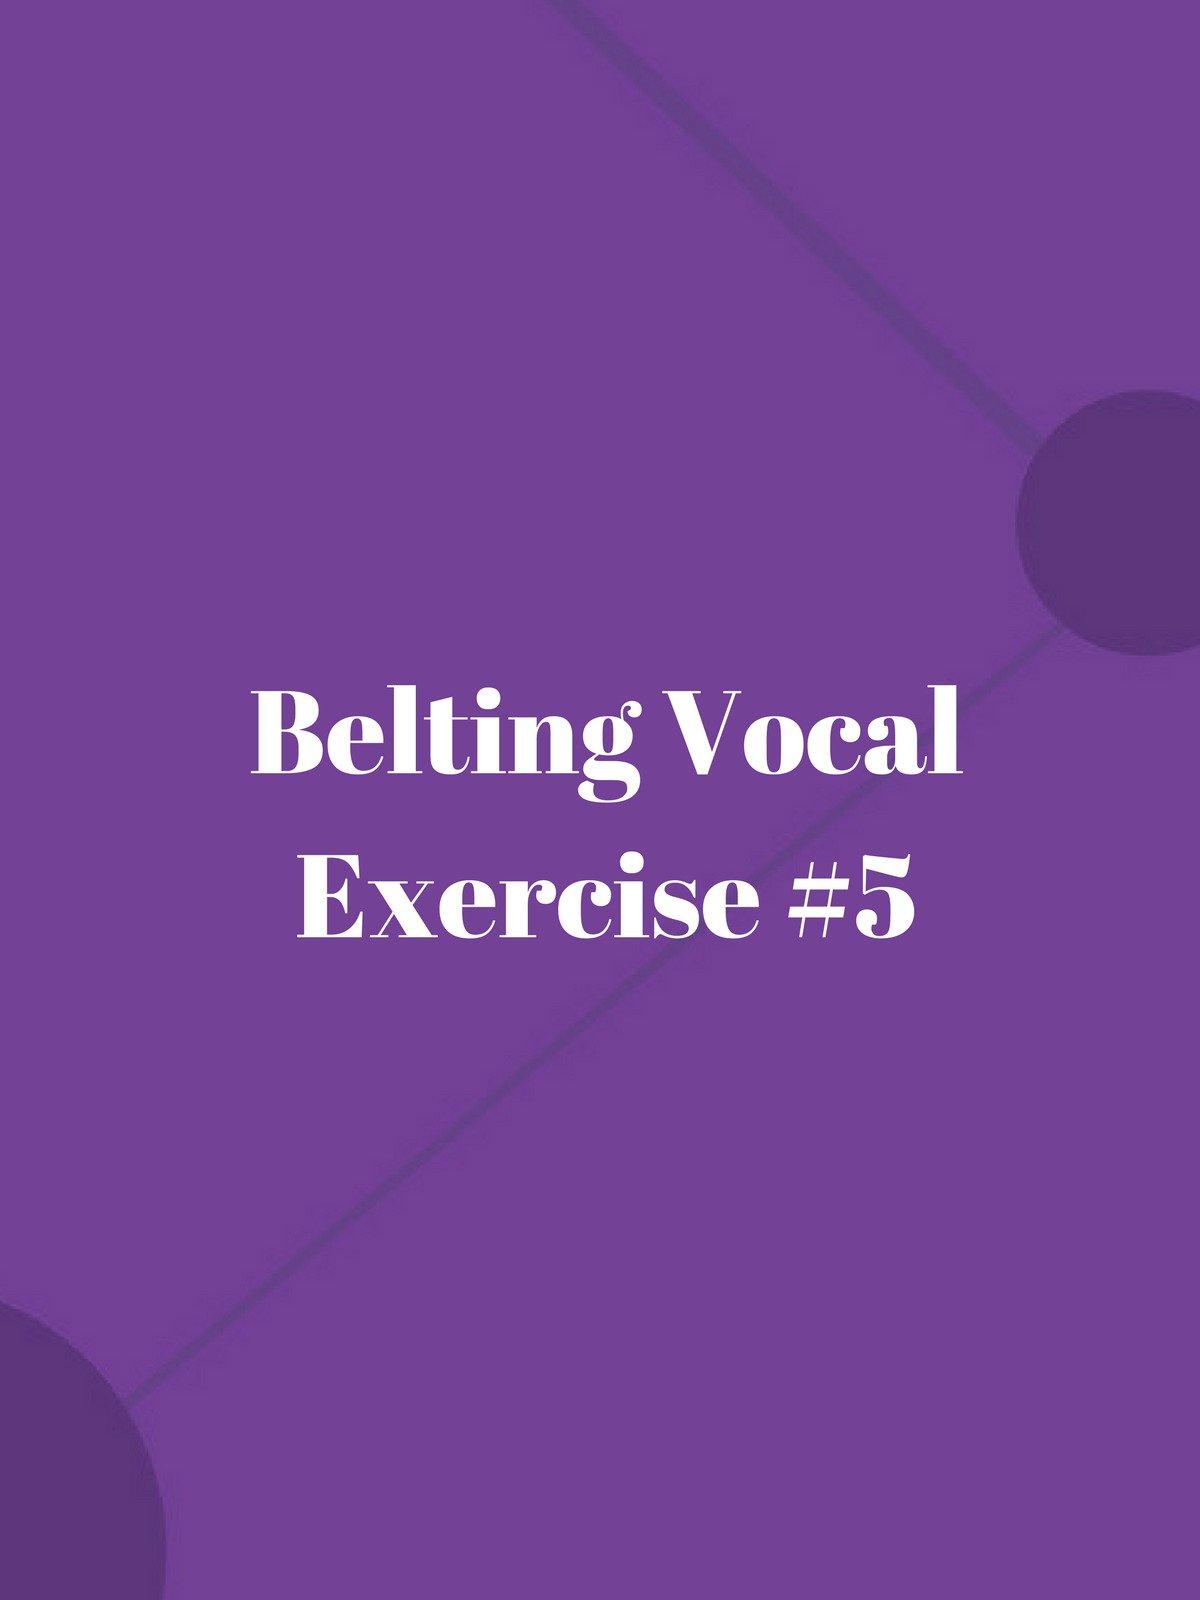 Belting Vocal Exercise #5